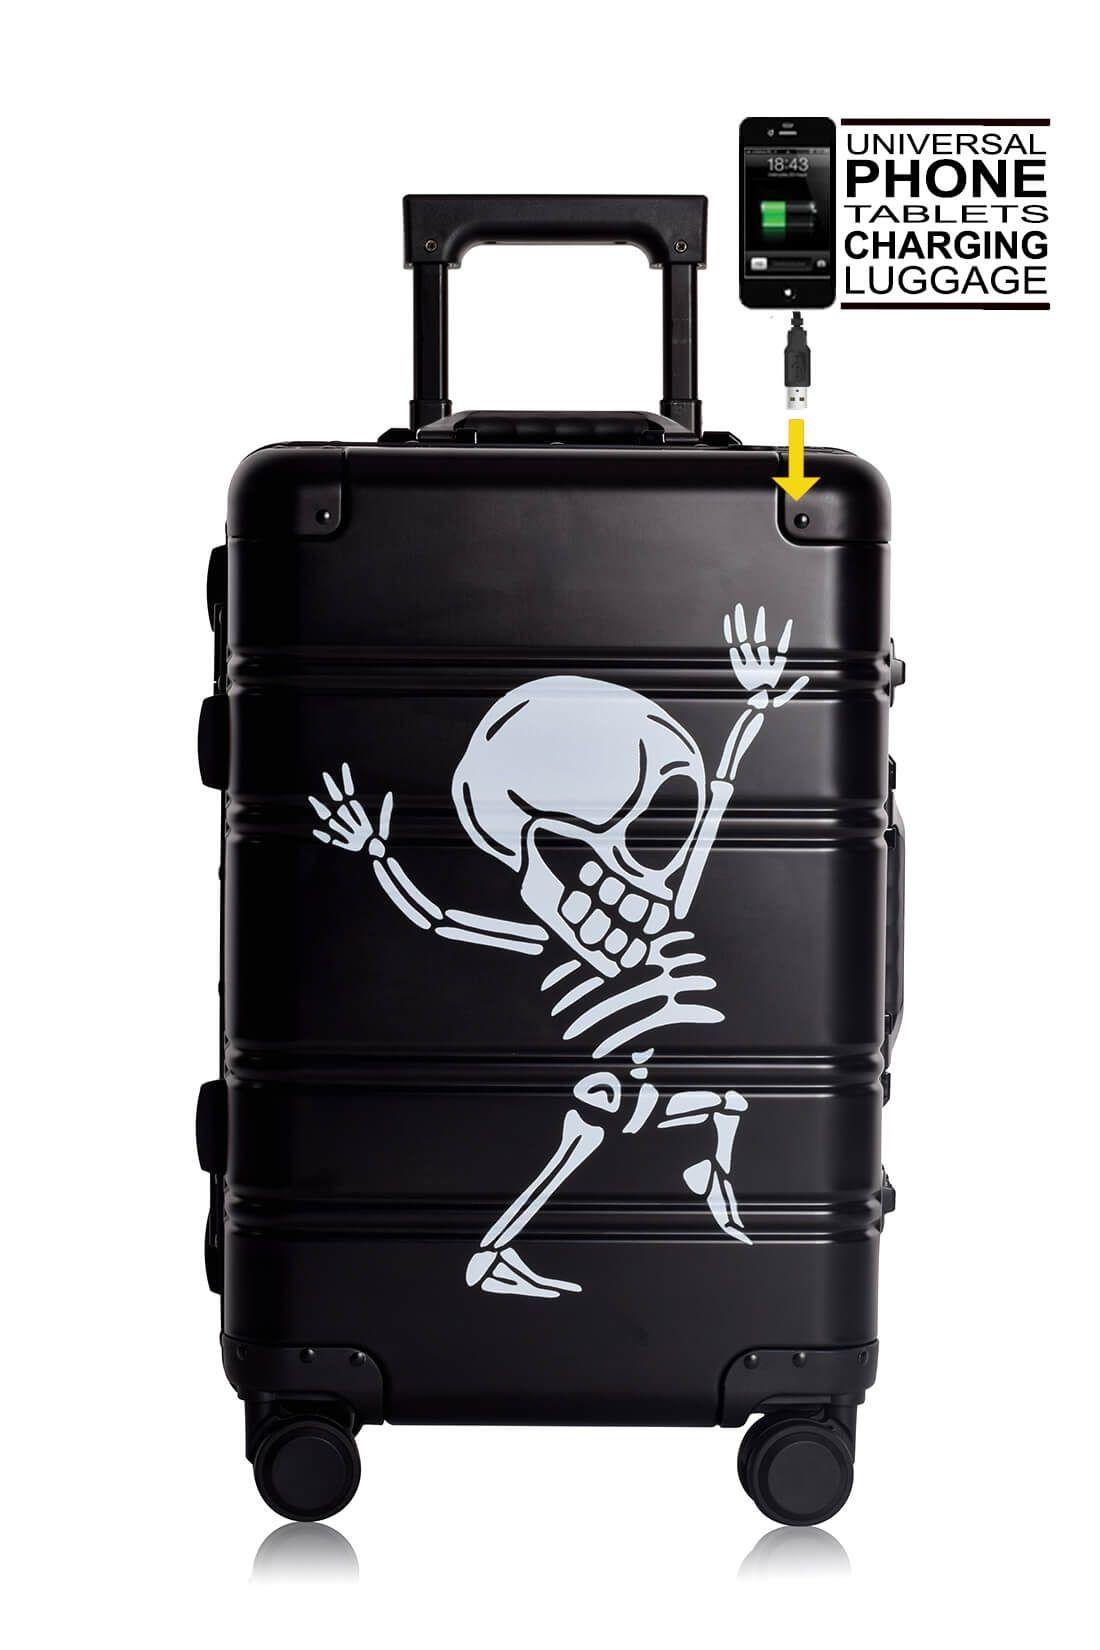 Aluminium Hand Cabin Luggage Premium Suitcase Trolley TOKYOTO LUGGAGE Model BLACK SKULL